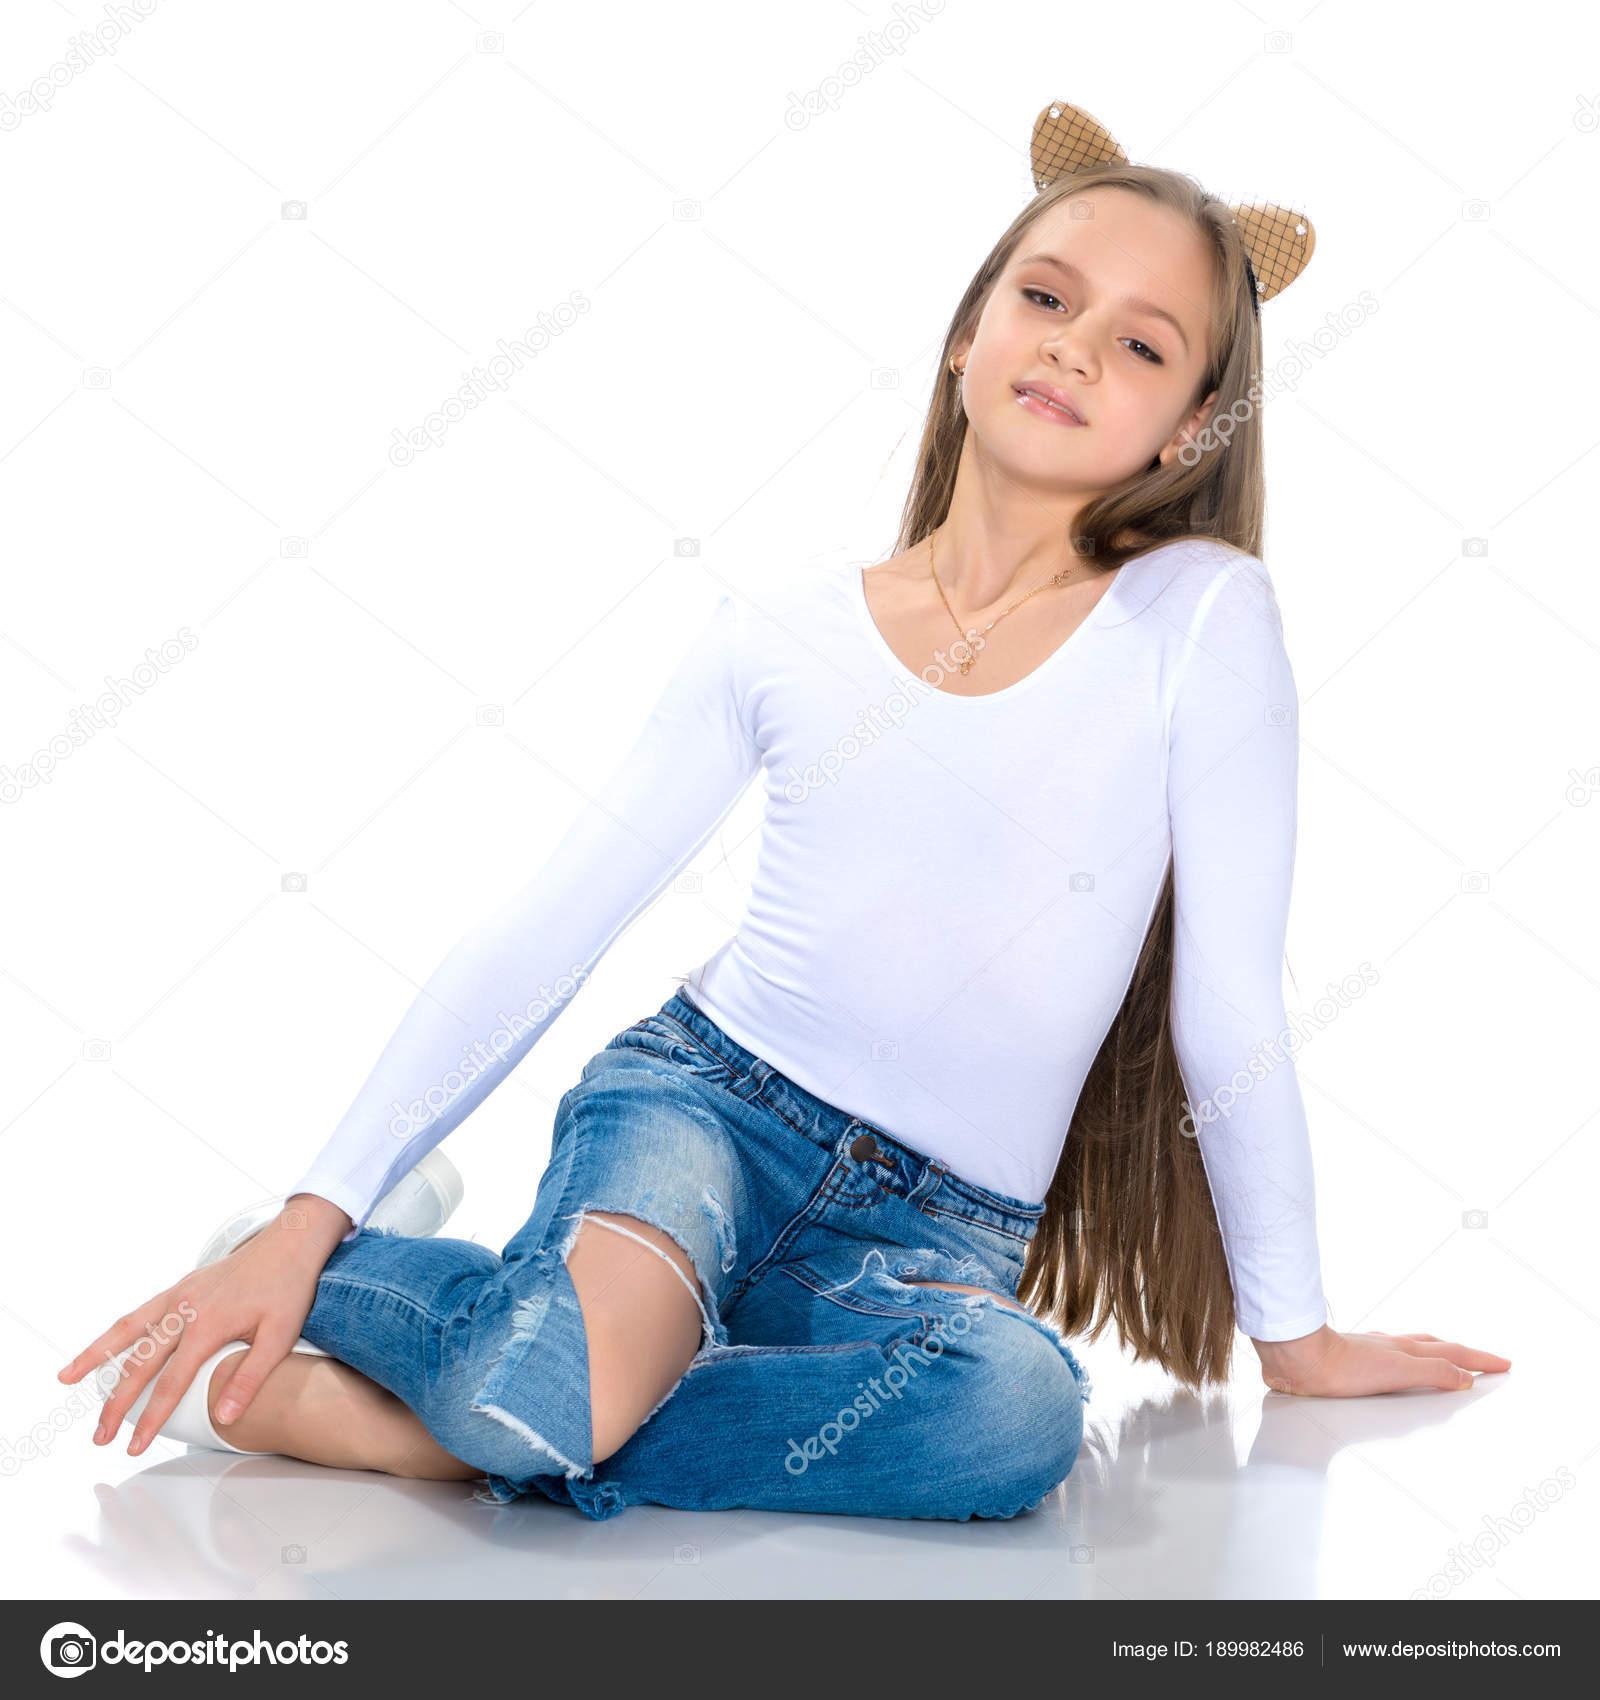 اجمل صور بنات 2020 اجمل صور بنات اطفال خلفيات بنات صغيره جميلة جدا 25